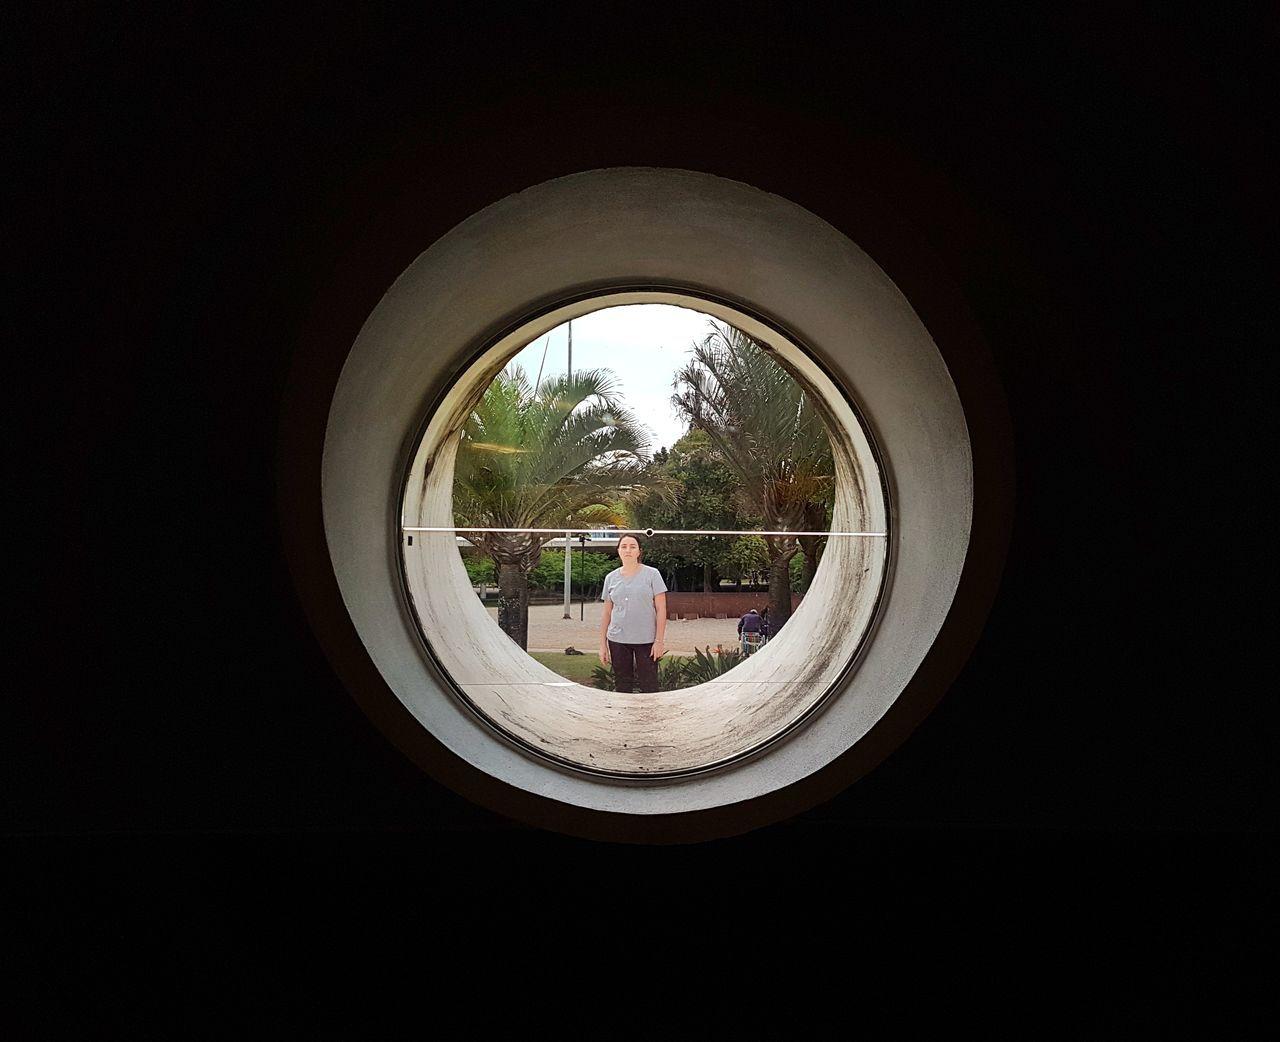 Circle View Point Window Light Window Window View Luznatural Luz Y Sombra  Janela Pelajanela Luz Y Sombra  Darkness Desafio Criatividade Criativity Beauty In Nature Selective Focus Indoors  Normal Light And Reflection Light And Shadow Circles